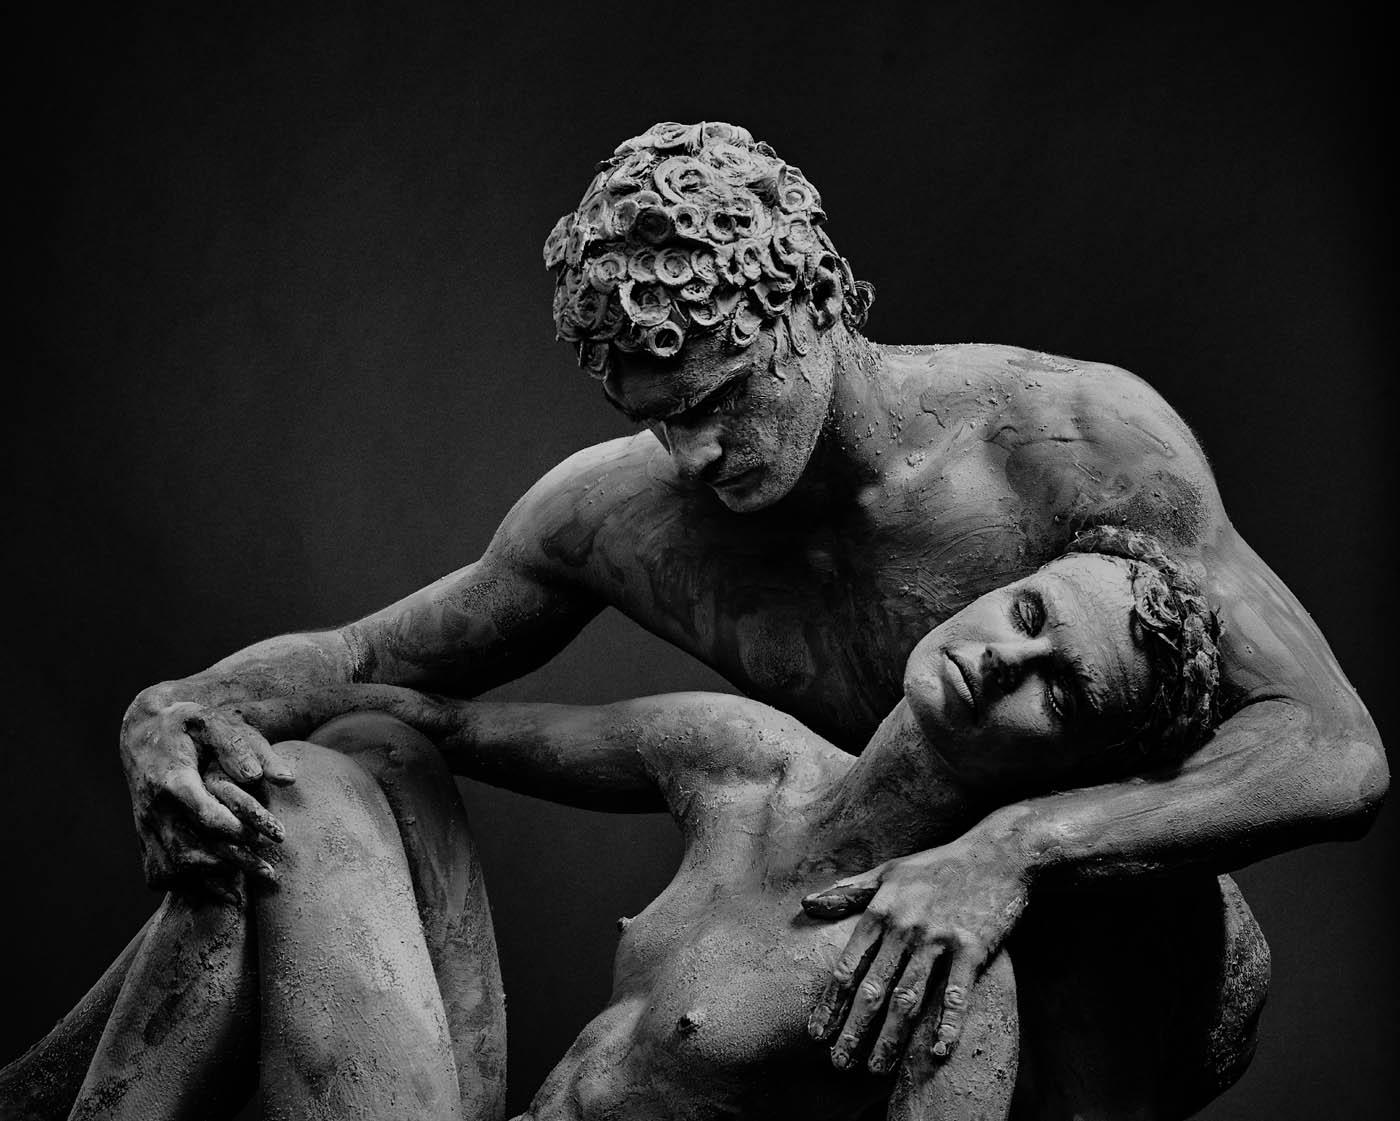 Sculptures-16-04-NCOI-by-RVDA-44516